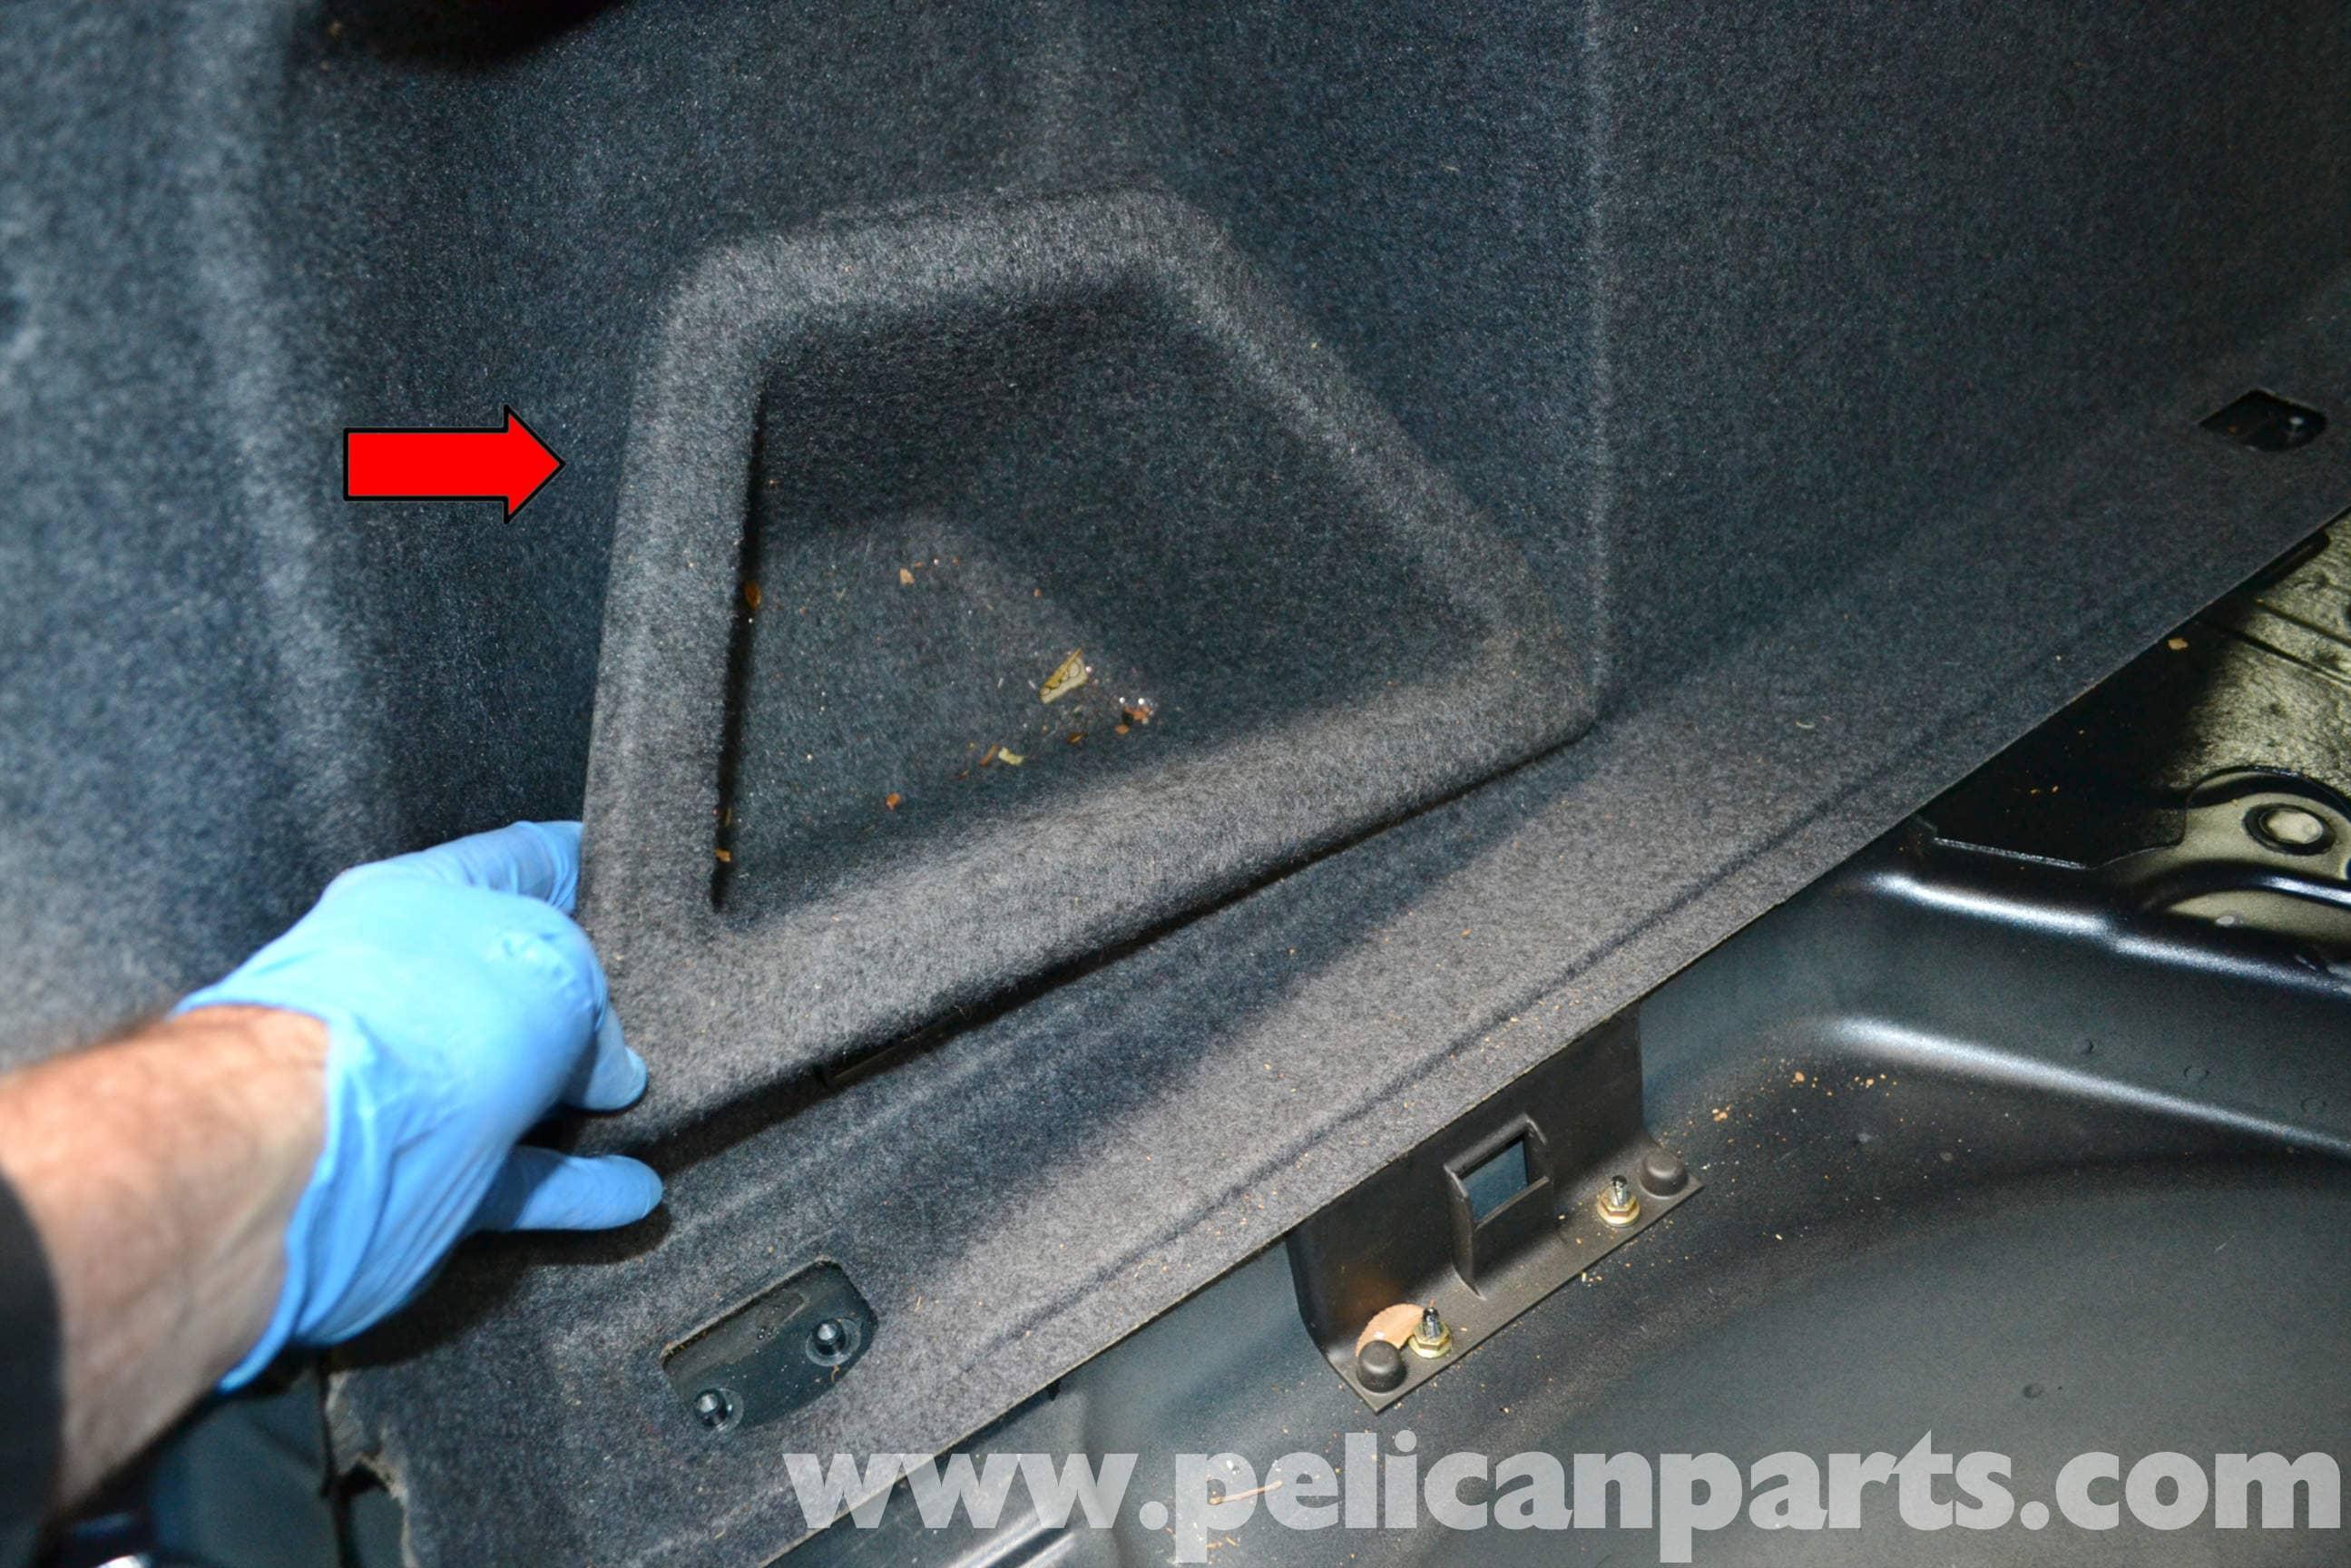 Audi A4 B6 Rear Interior Panel Removal 2002 2008